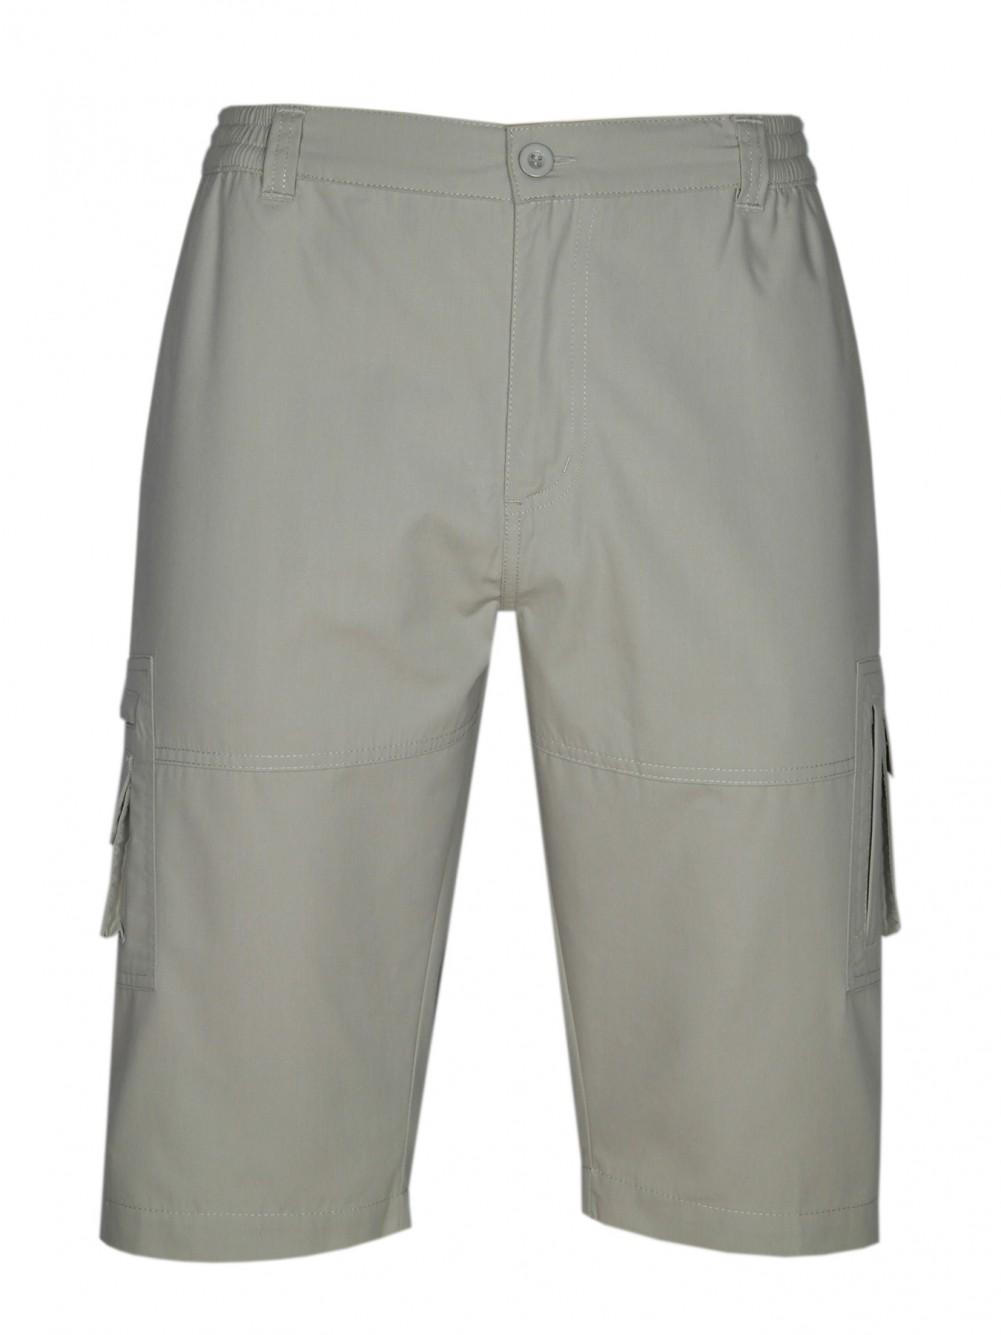 Baumwoll Trekkingshorts, kurze Hose Herren - Beige